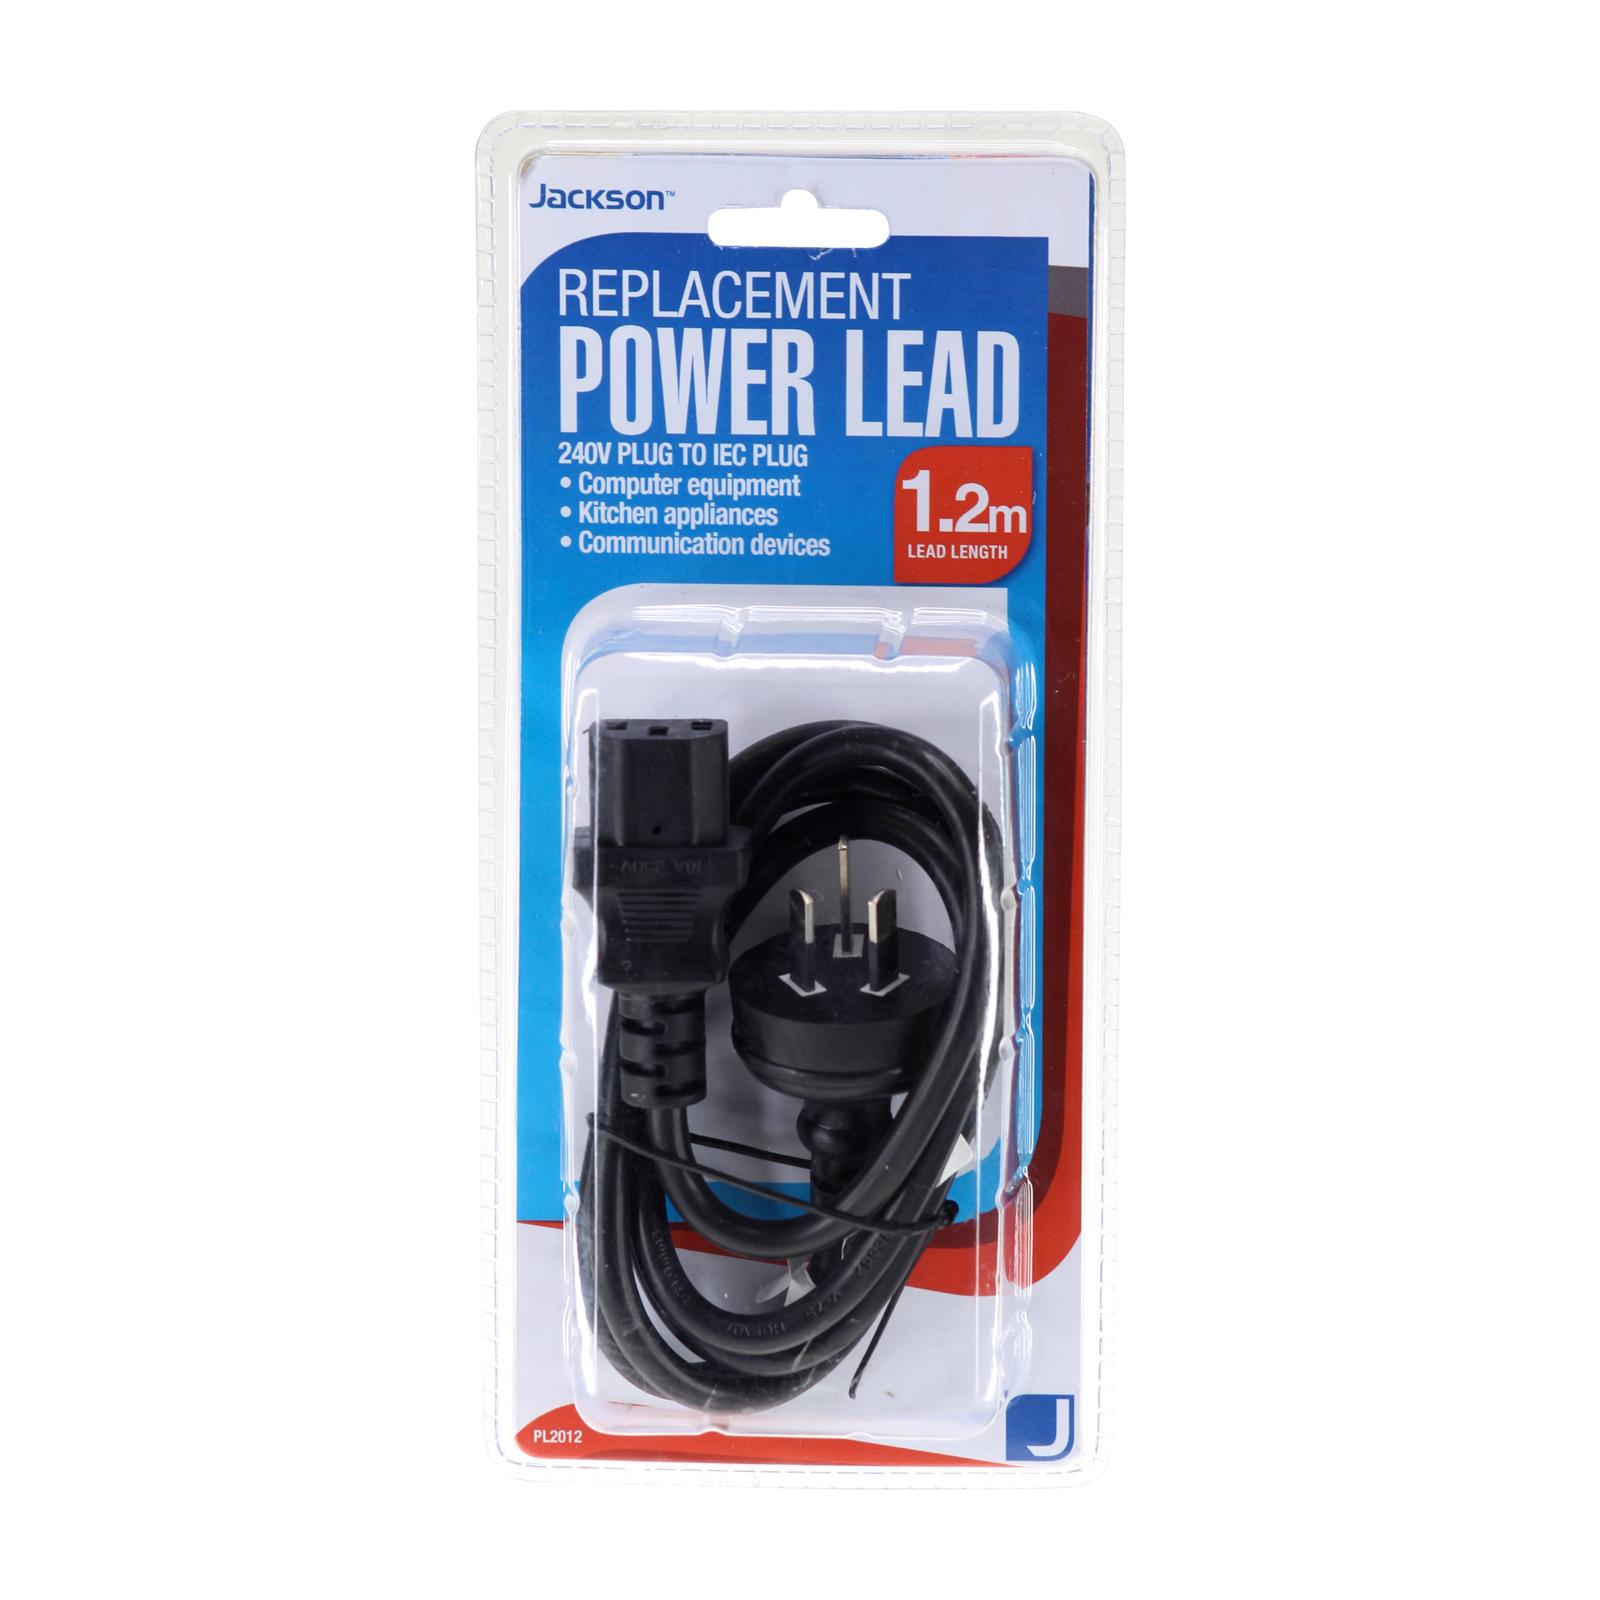 Jackson 1.2m Replacement IEC Power Lead